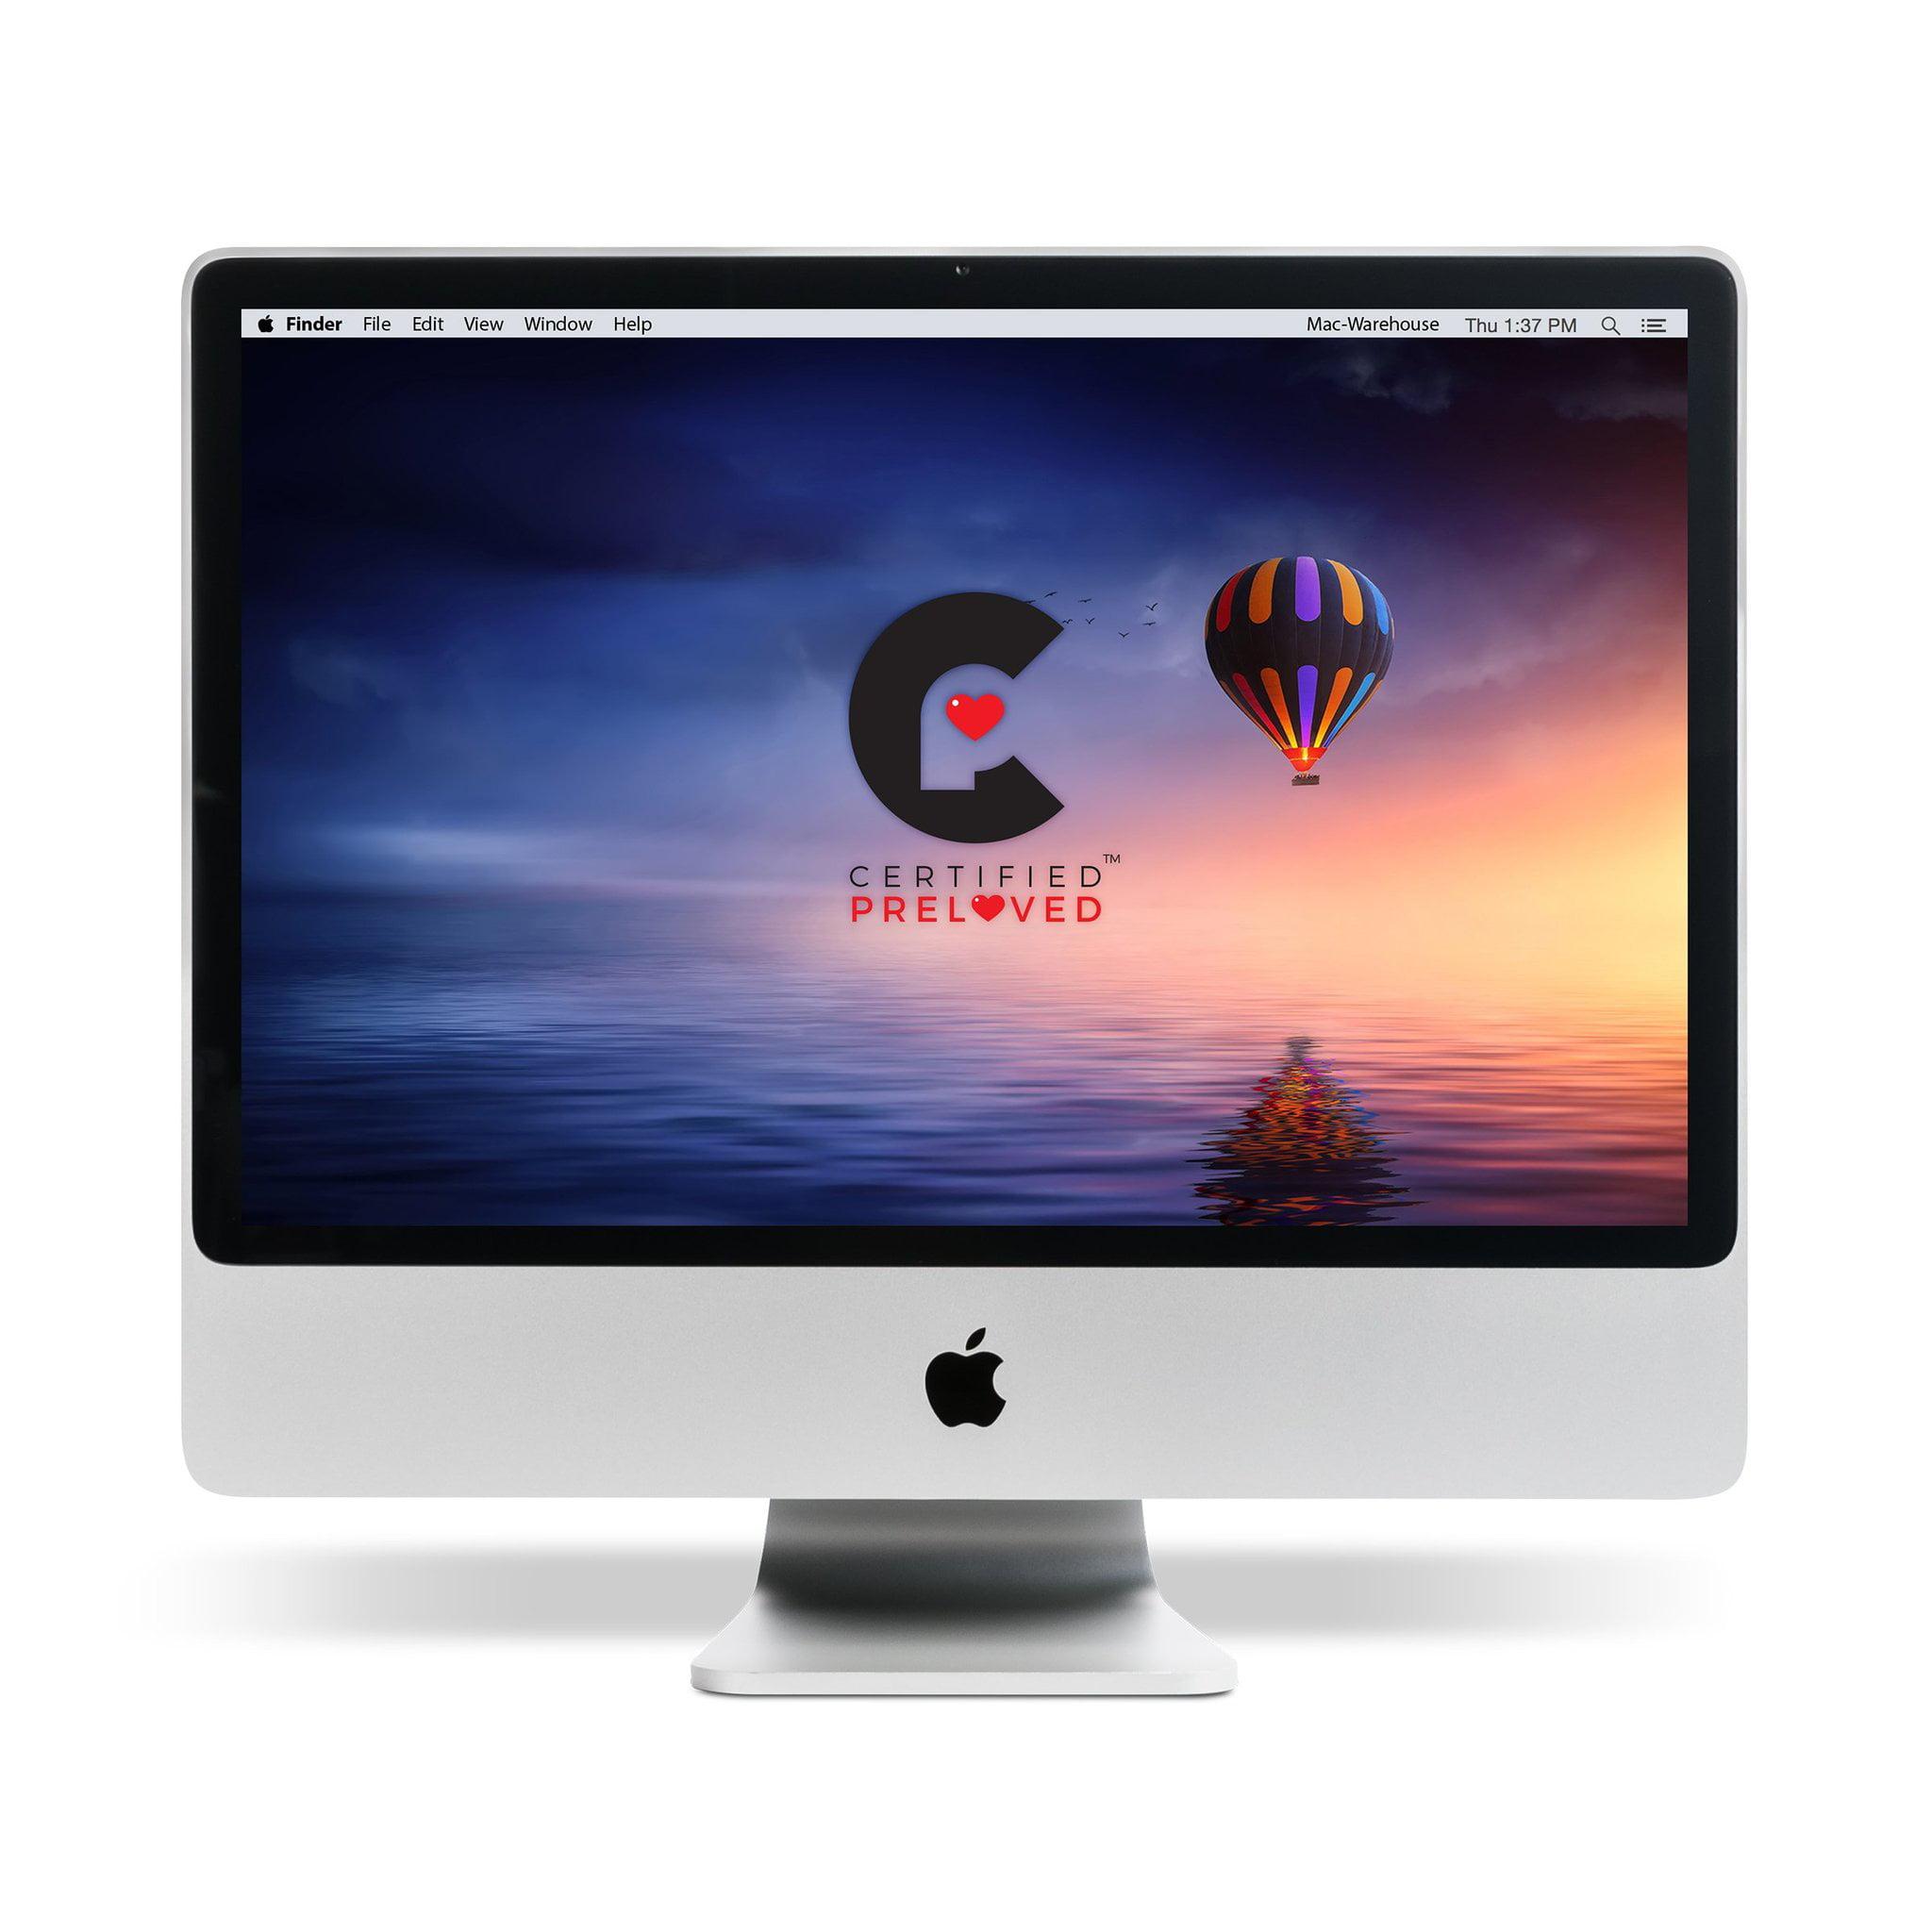 "Apple iMac 20"" Core 2 Duo T7300 2.0GHz All-In-One Computer - 2GB 250GB DVD±RW Radeon HD 2400 XT (Mid 2007) Refurbished"